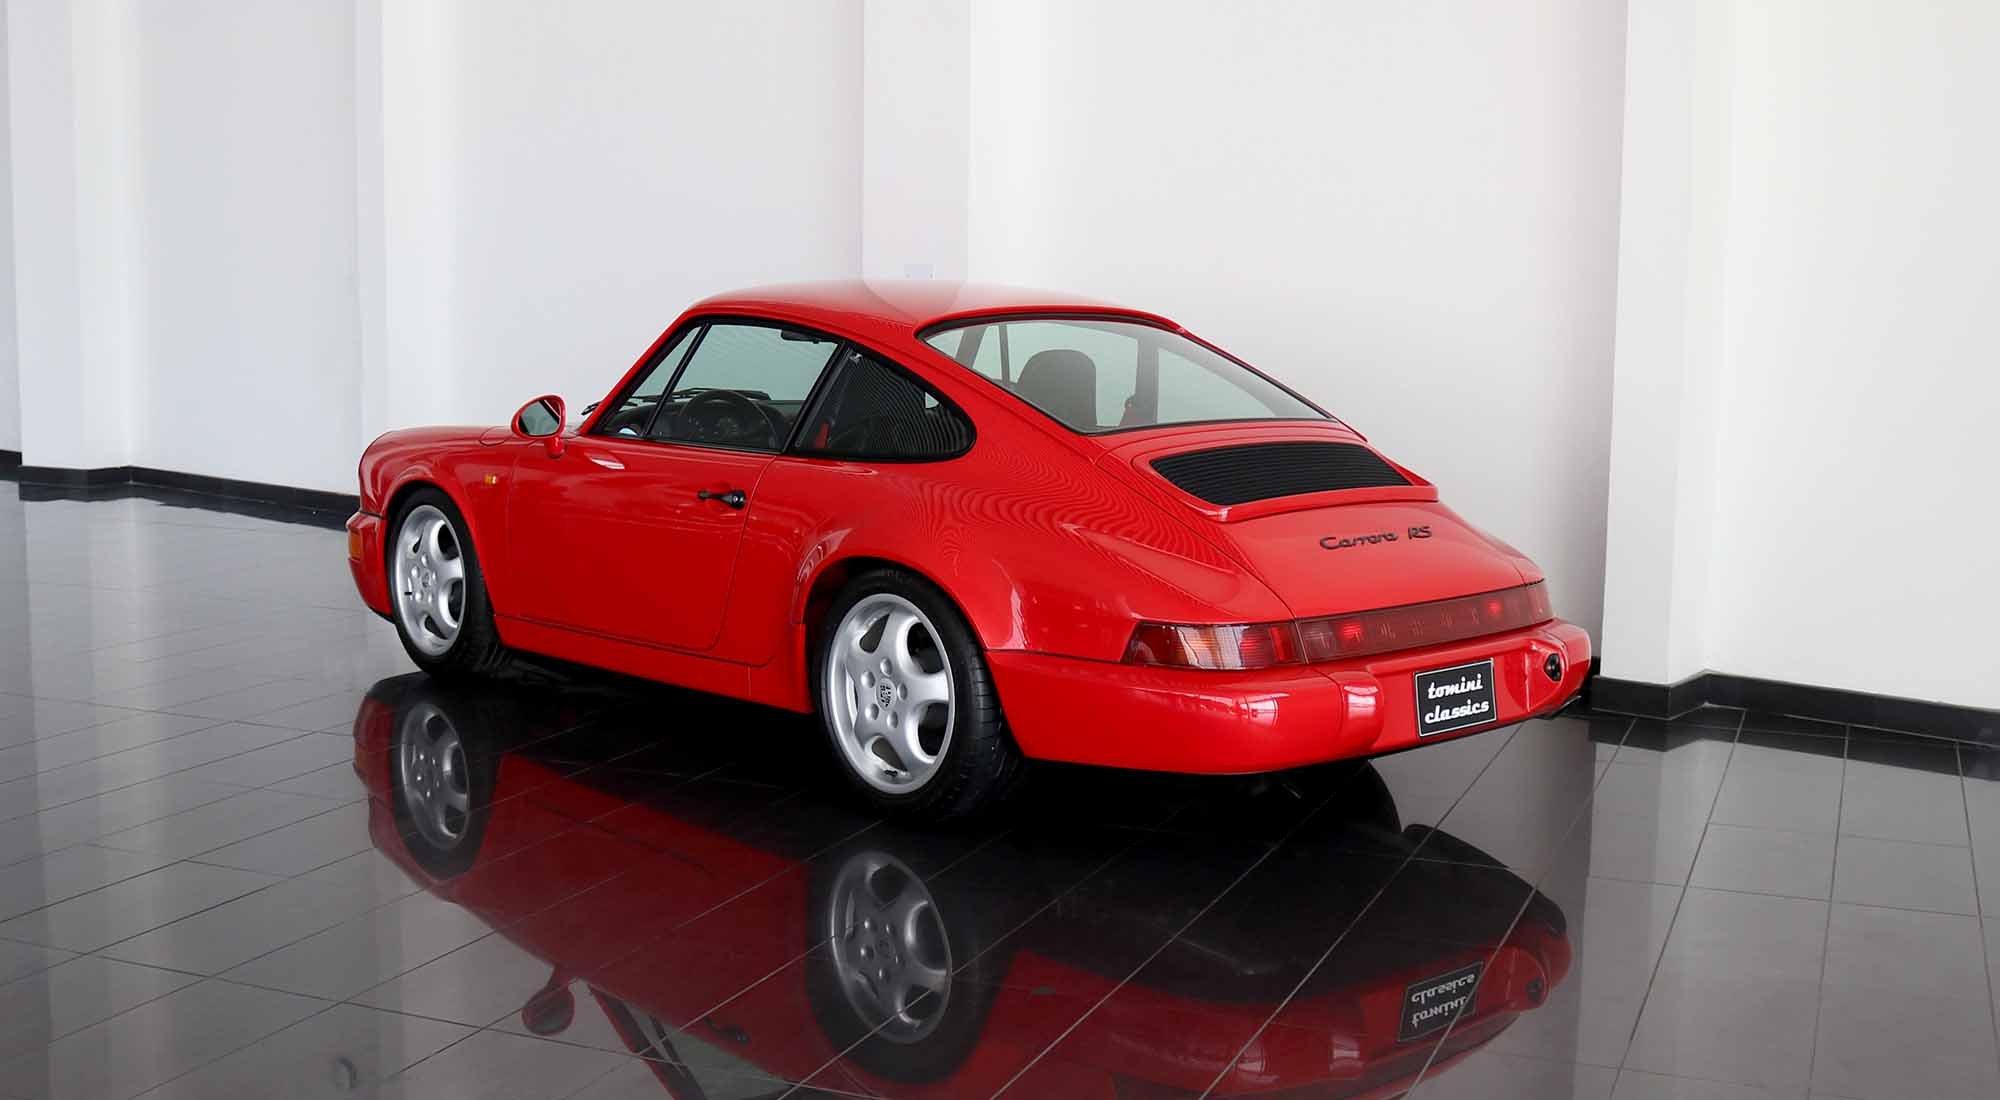 Porsche 964 Carrera RS (1992) For Sale (picture 3 of 6)